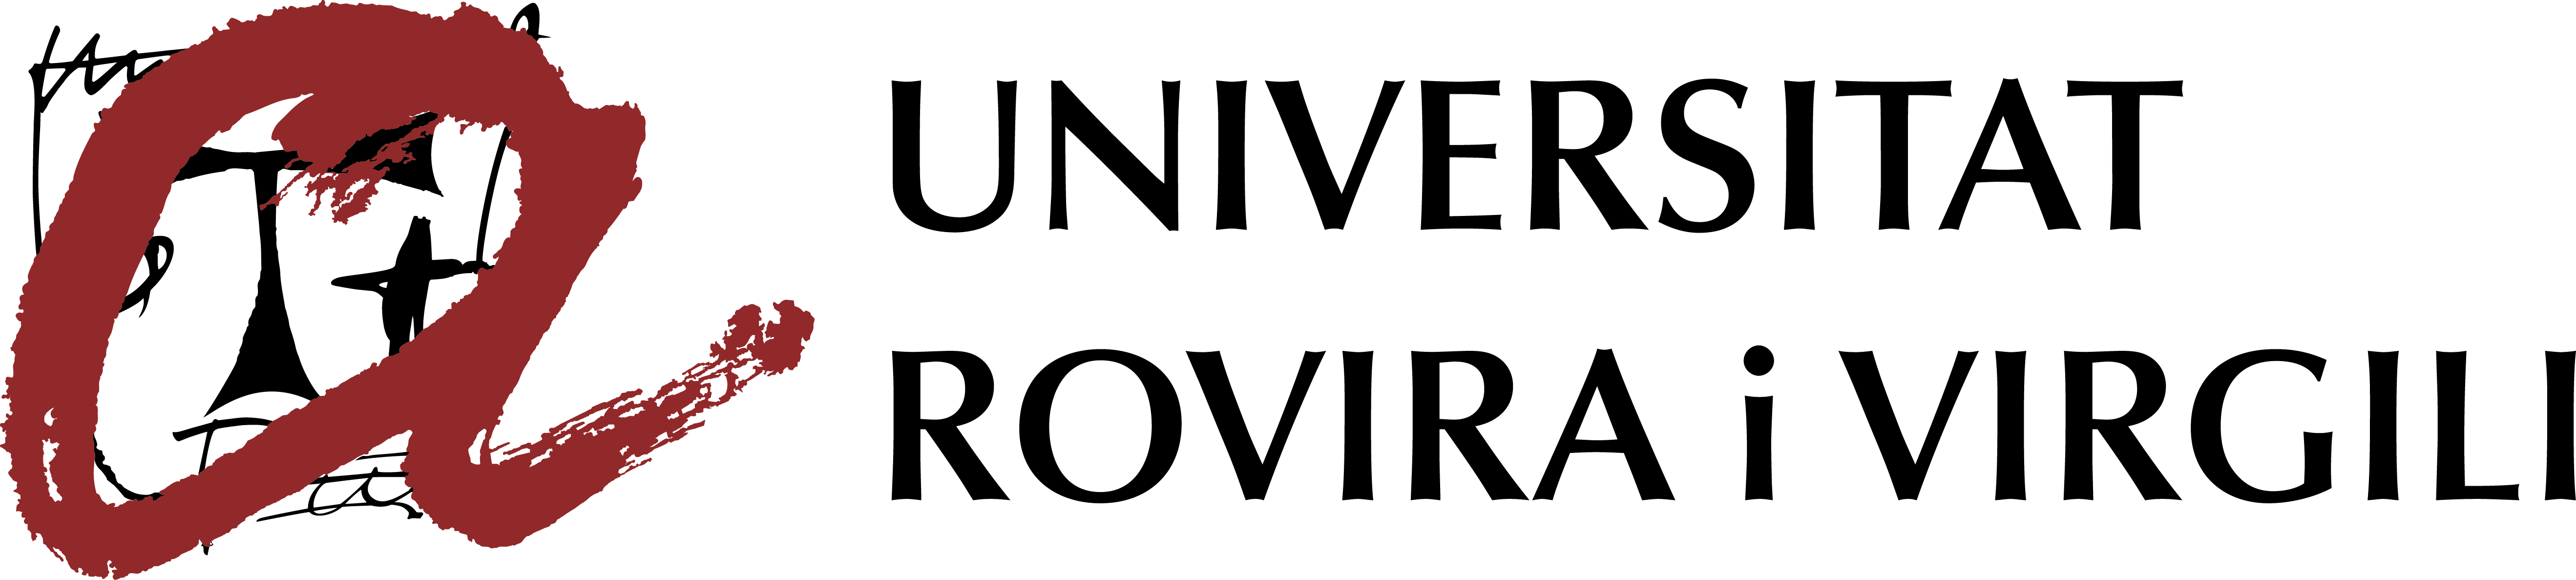 logos urv identidad institucional universitat rovira i youtube logos wikia youtube logopedia